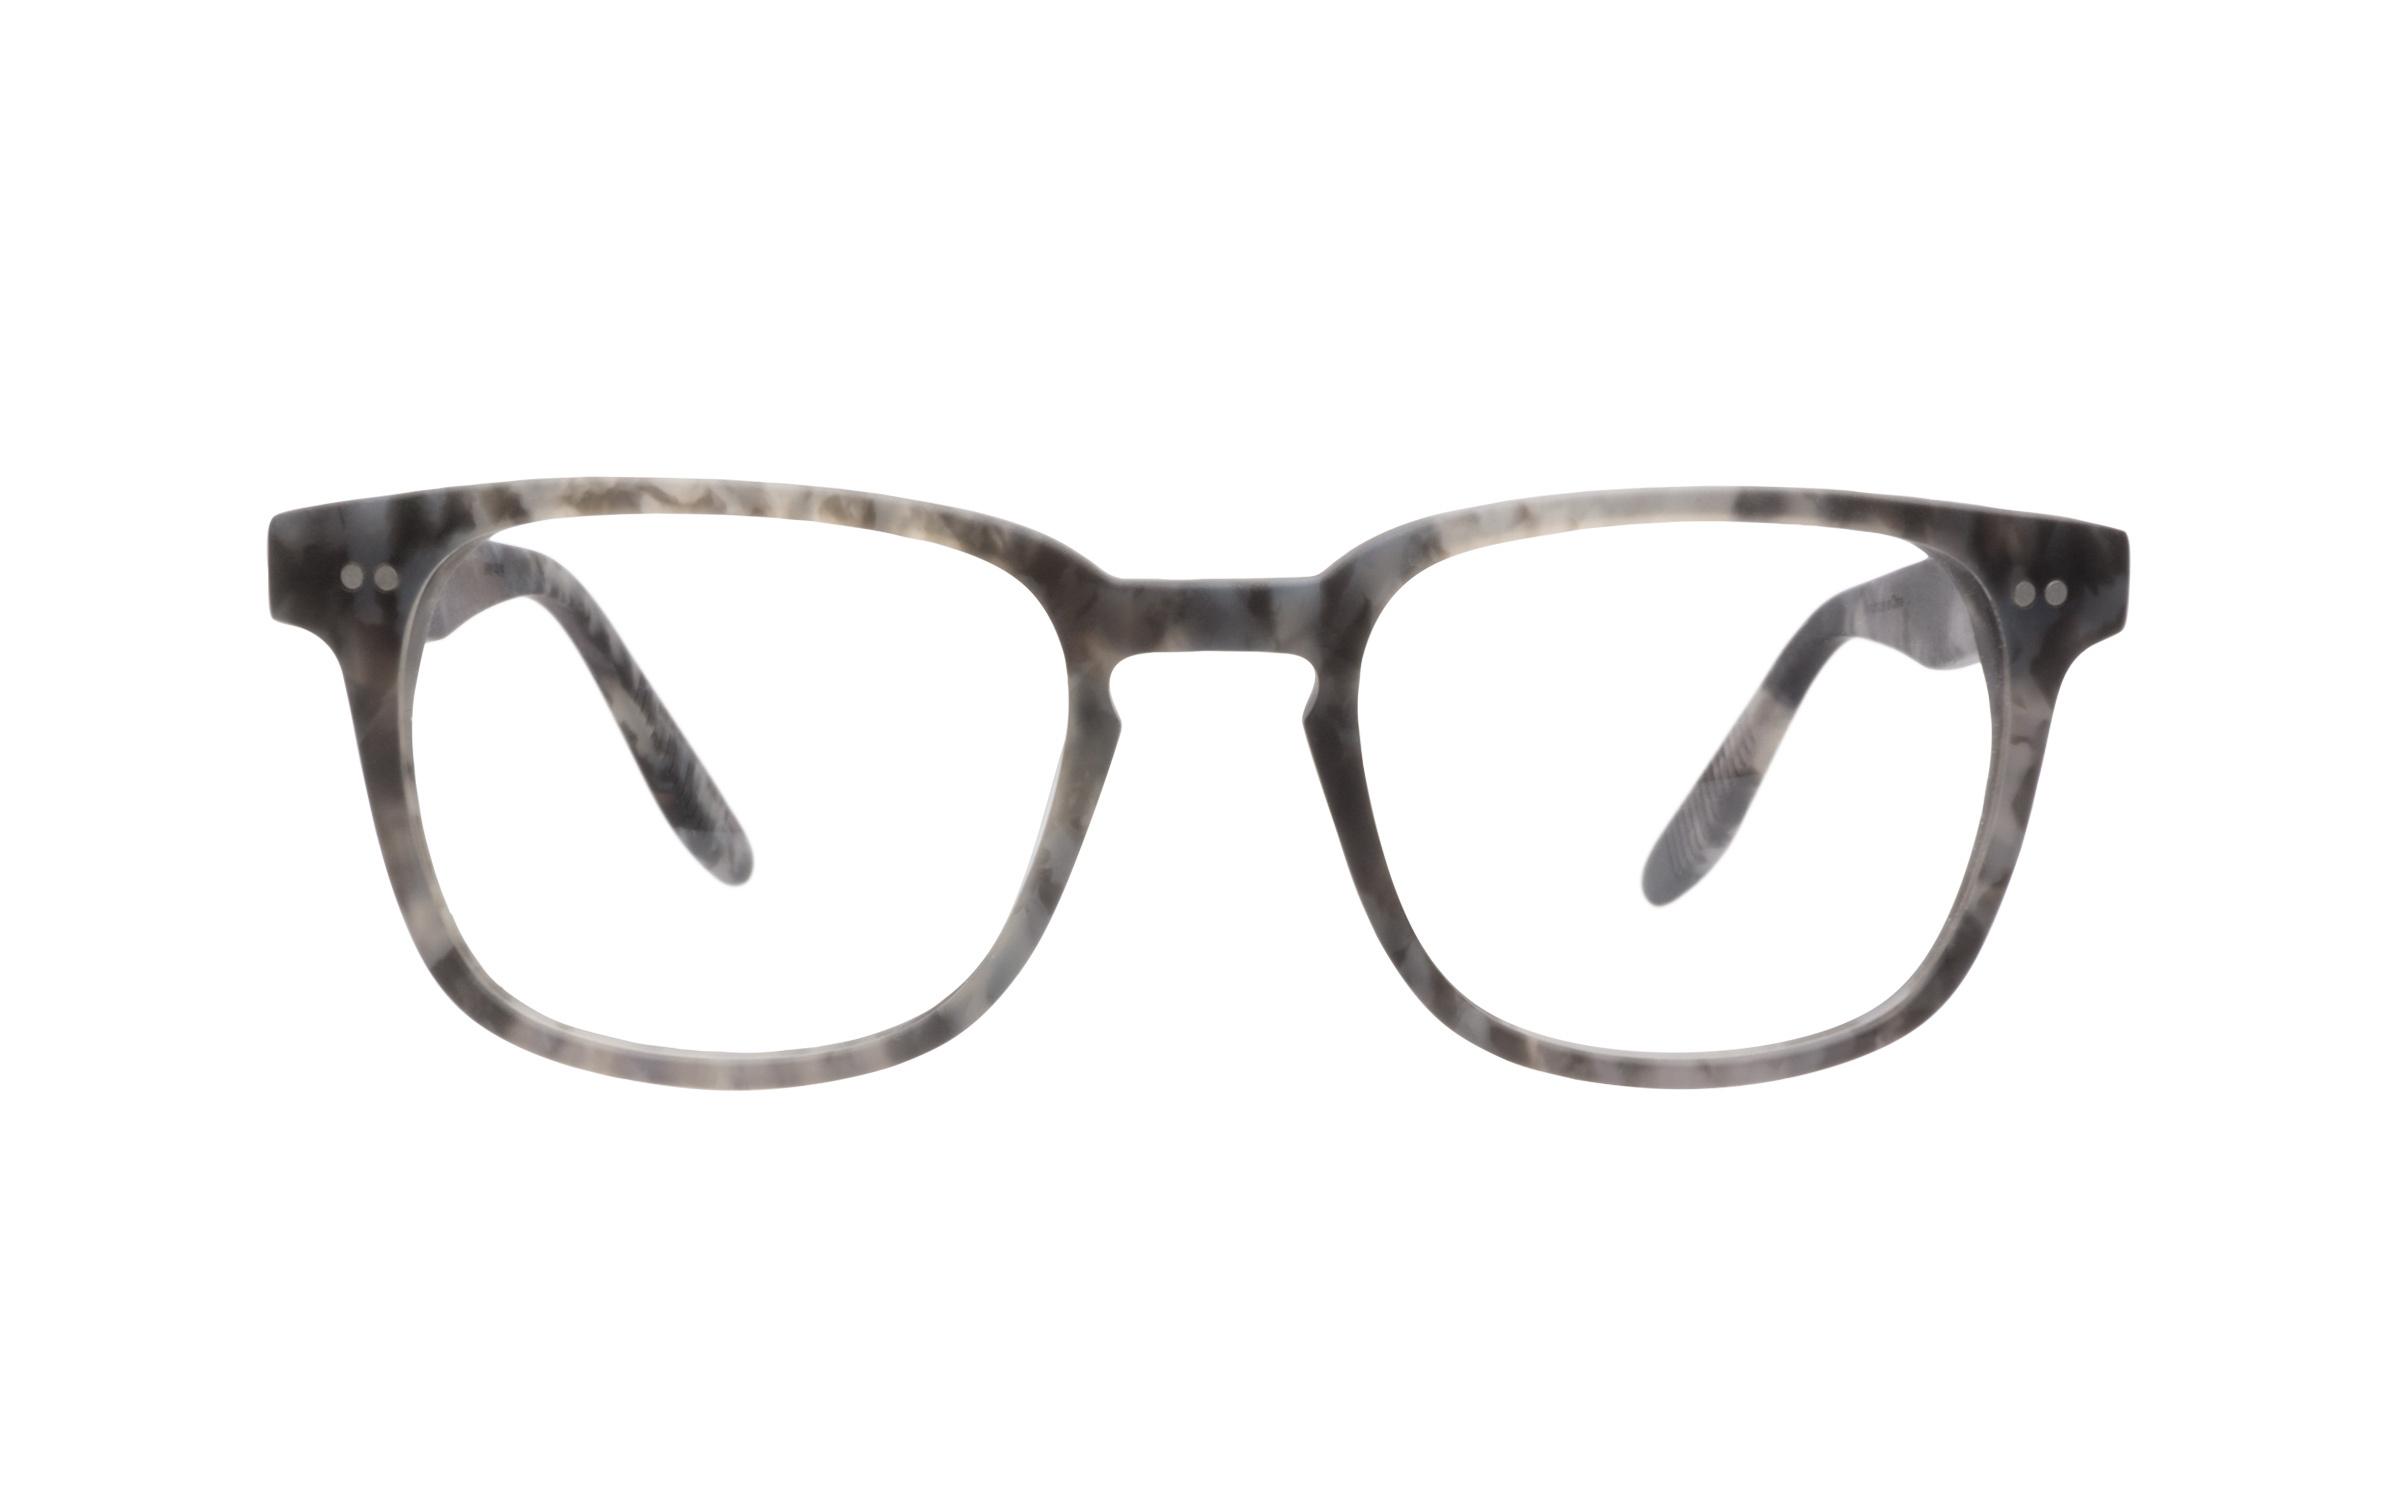 Vintage_Glasses_Grey_Joseph_Marc_Online_Coastal